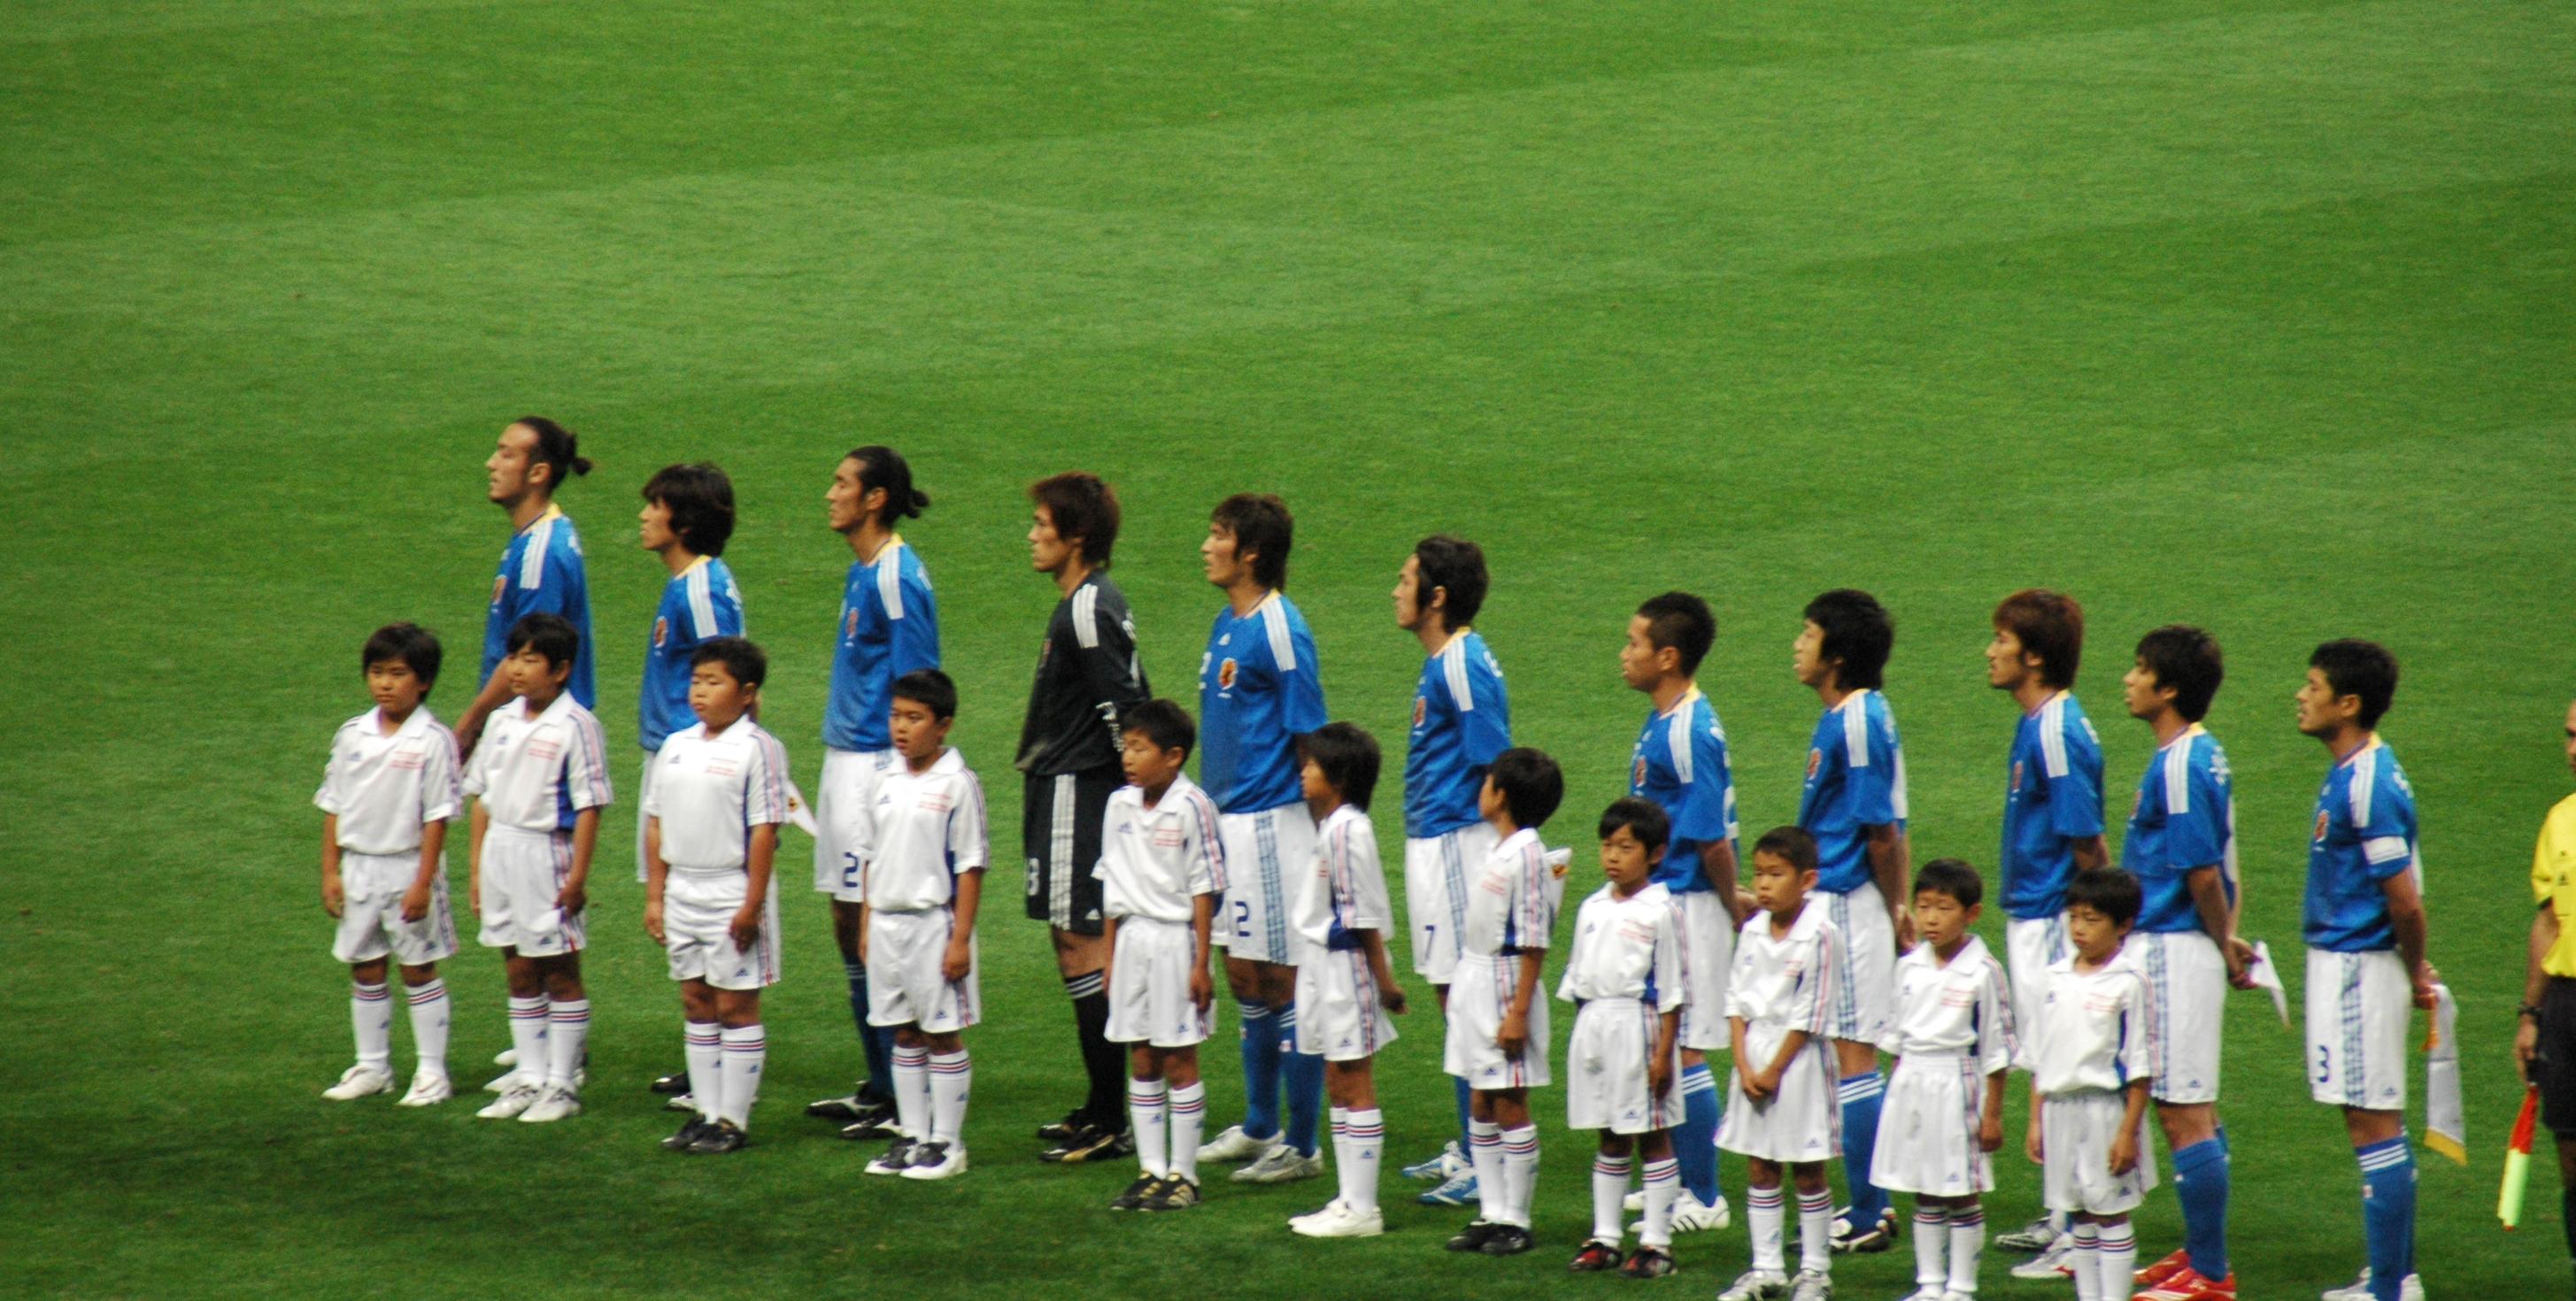 c1971c304 Japan national football team - Wikipedia